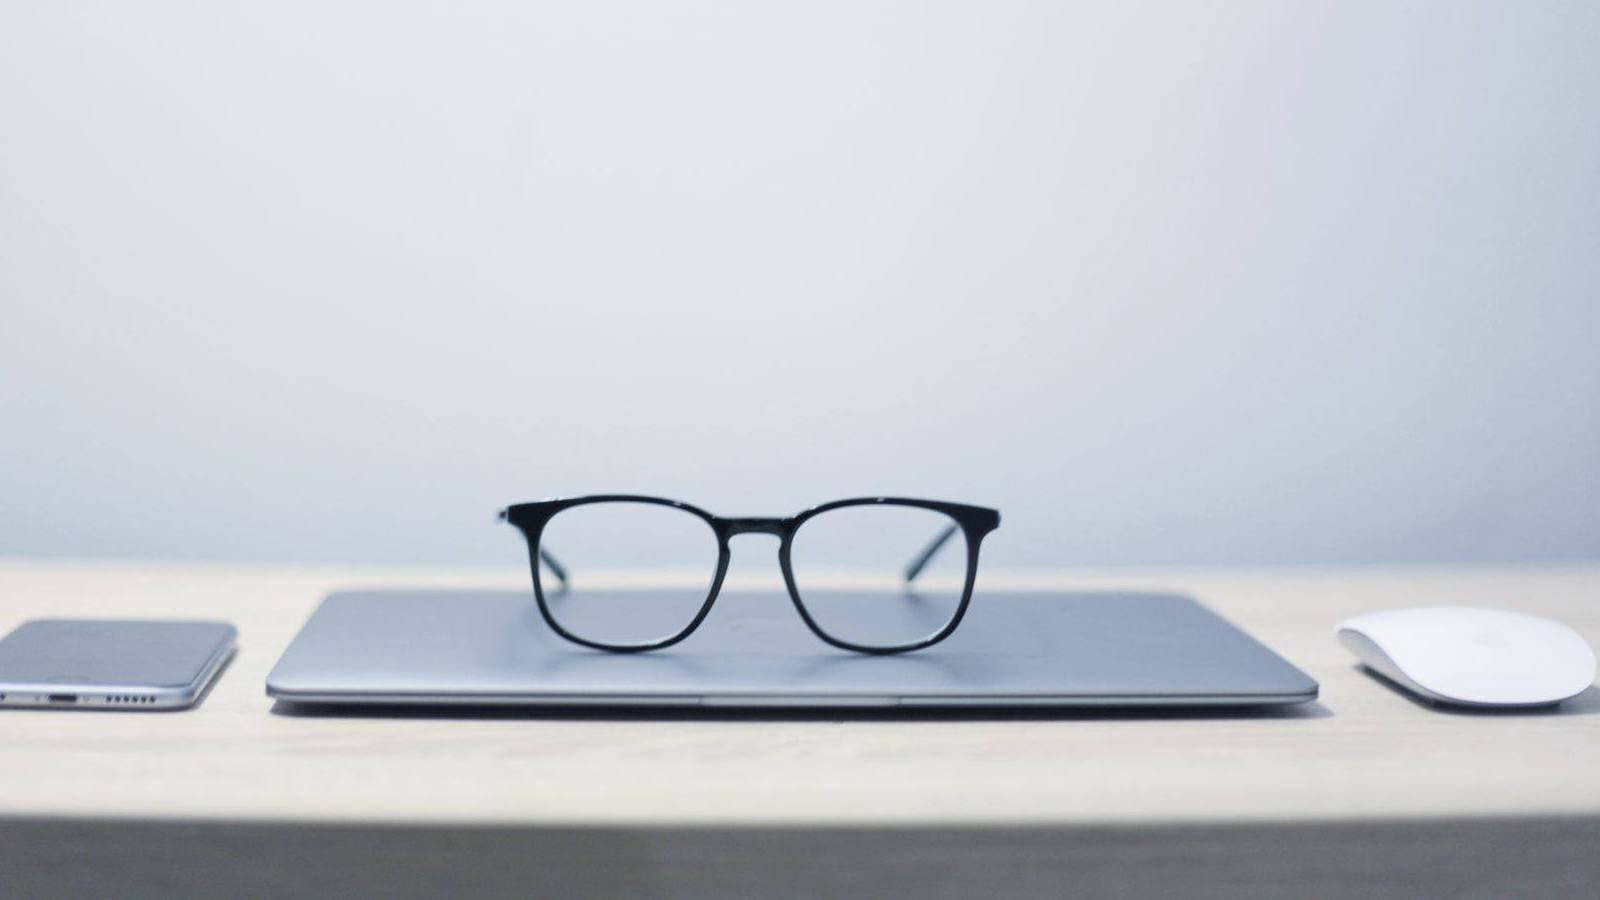 Lensabl Everyday Eyewear anti-blue-light glasses offer more than 30 frame styles